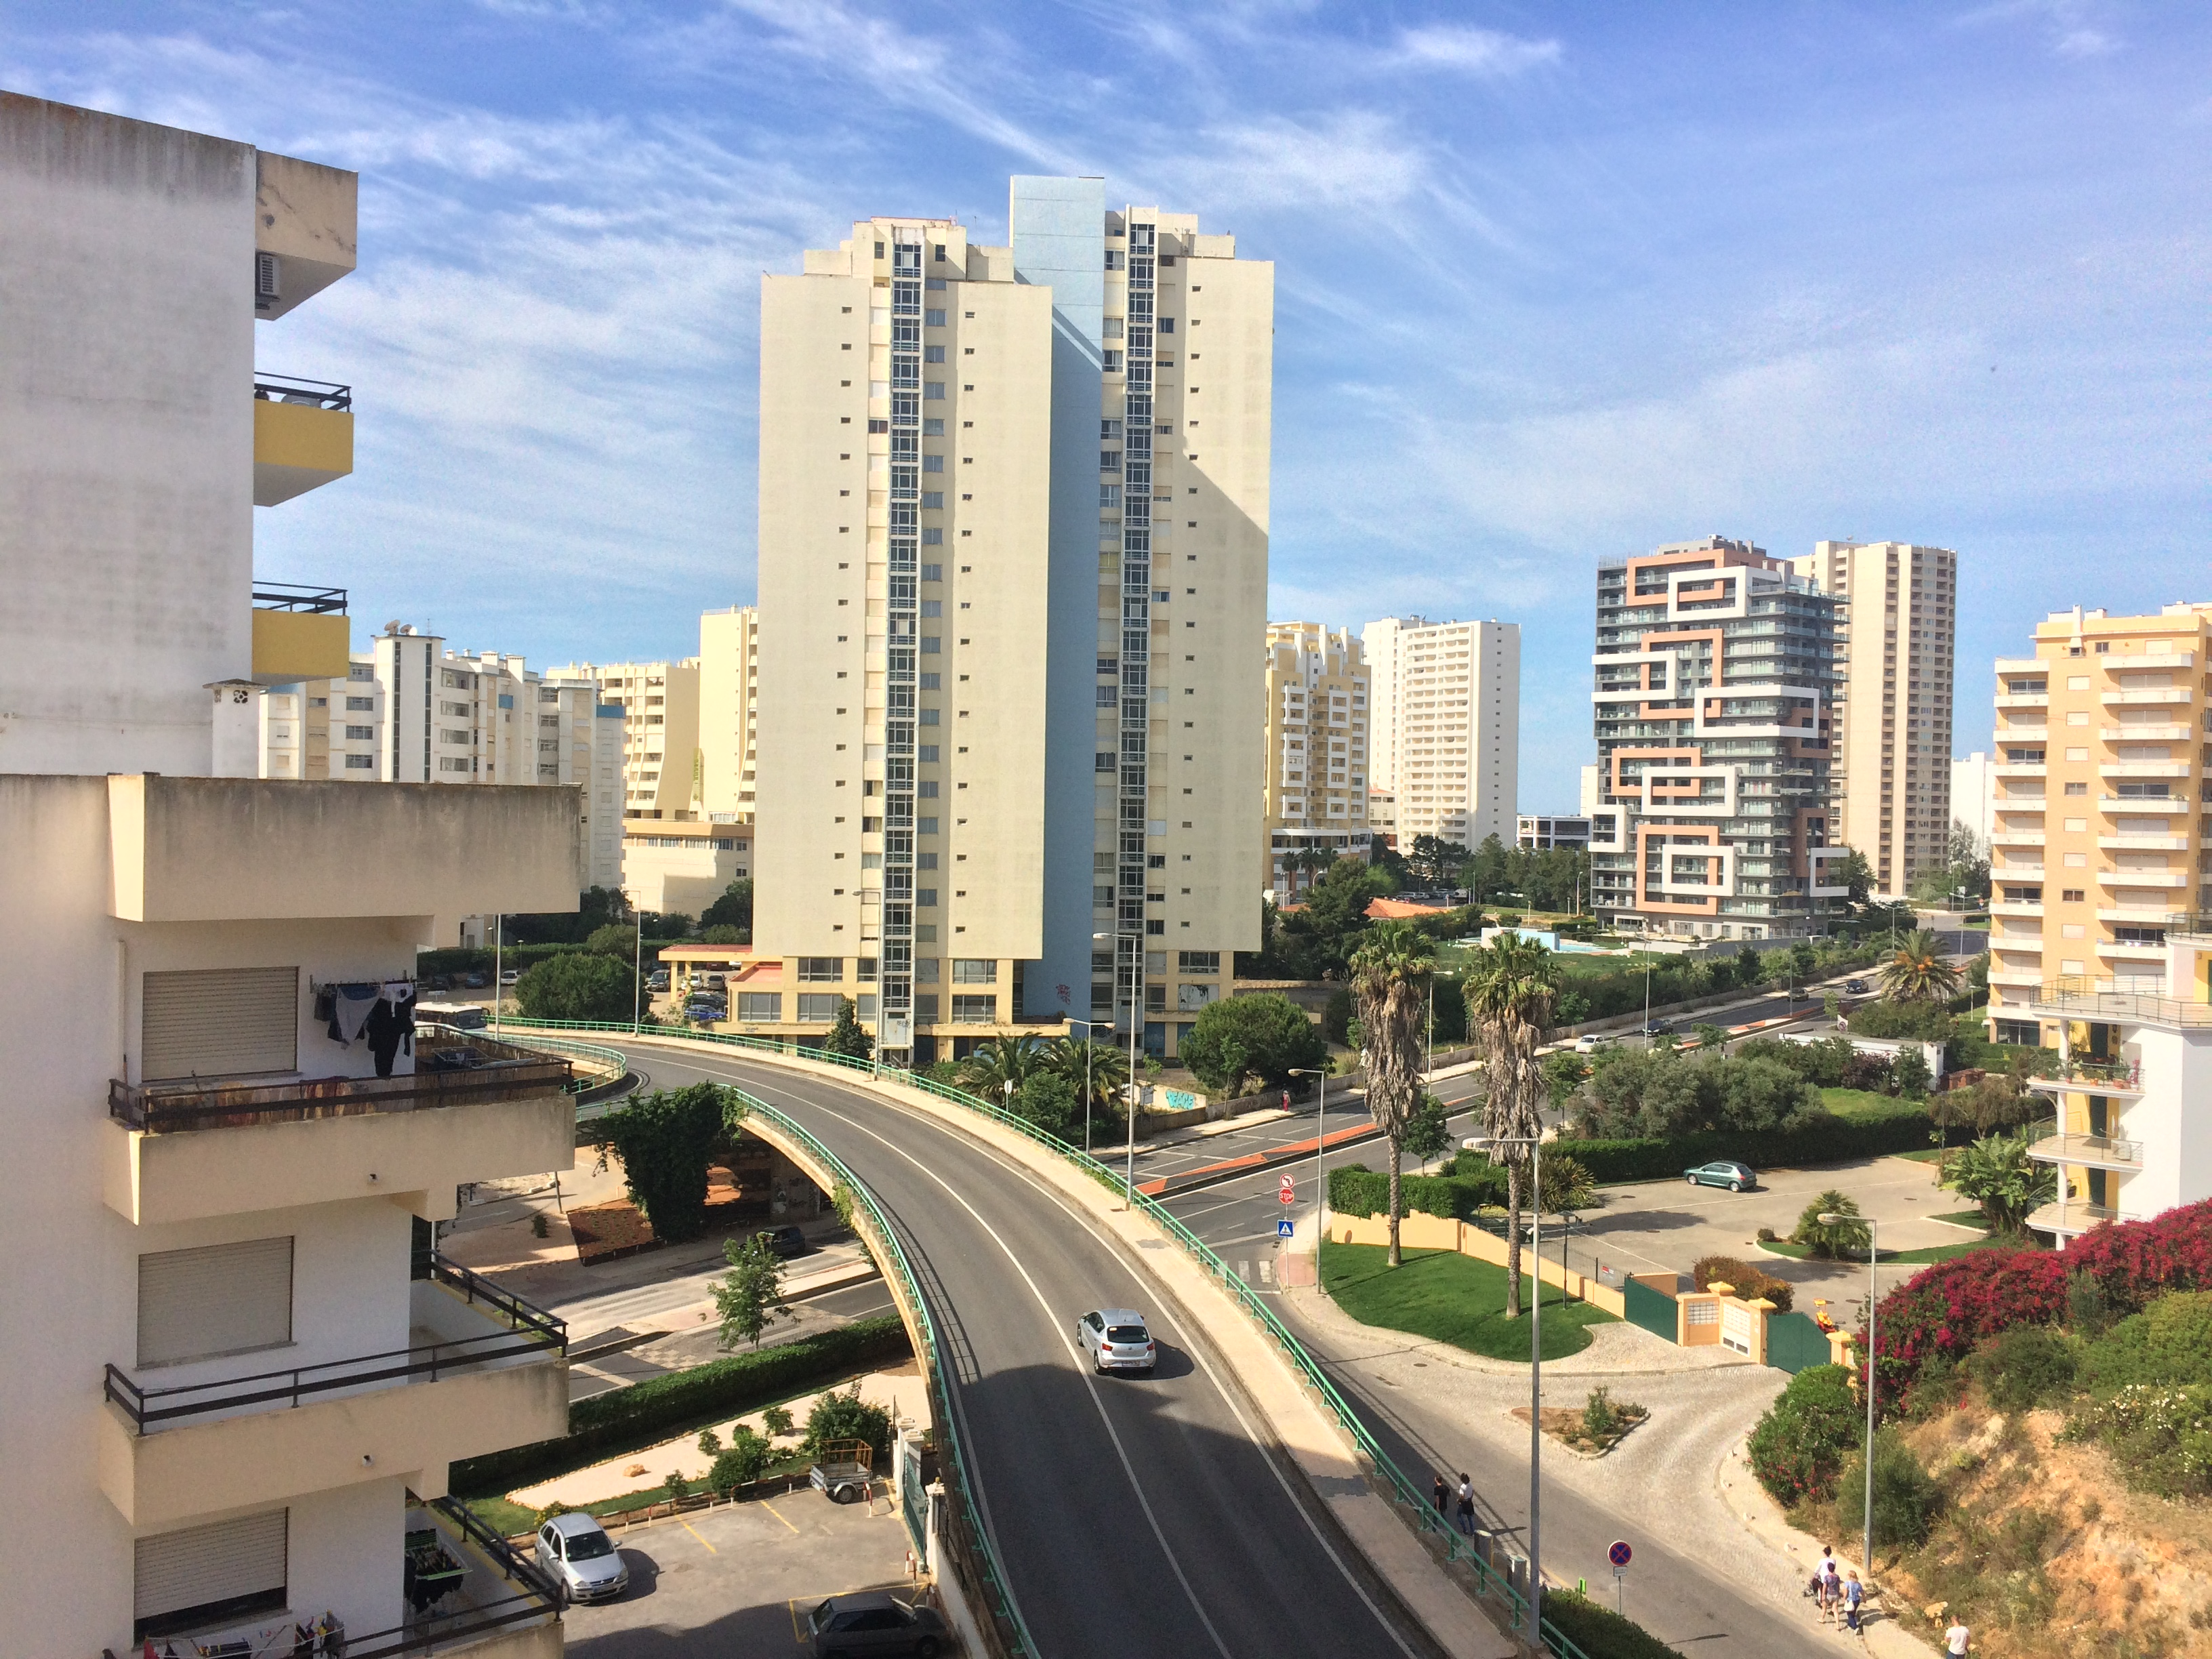 Location appartements et villas de vacance, ROCHA PATIO – T1 BEACH APARTMENT - PORTIMÃO à Portimão, Portugal Algarve, REF_IMG_205_207